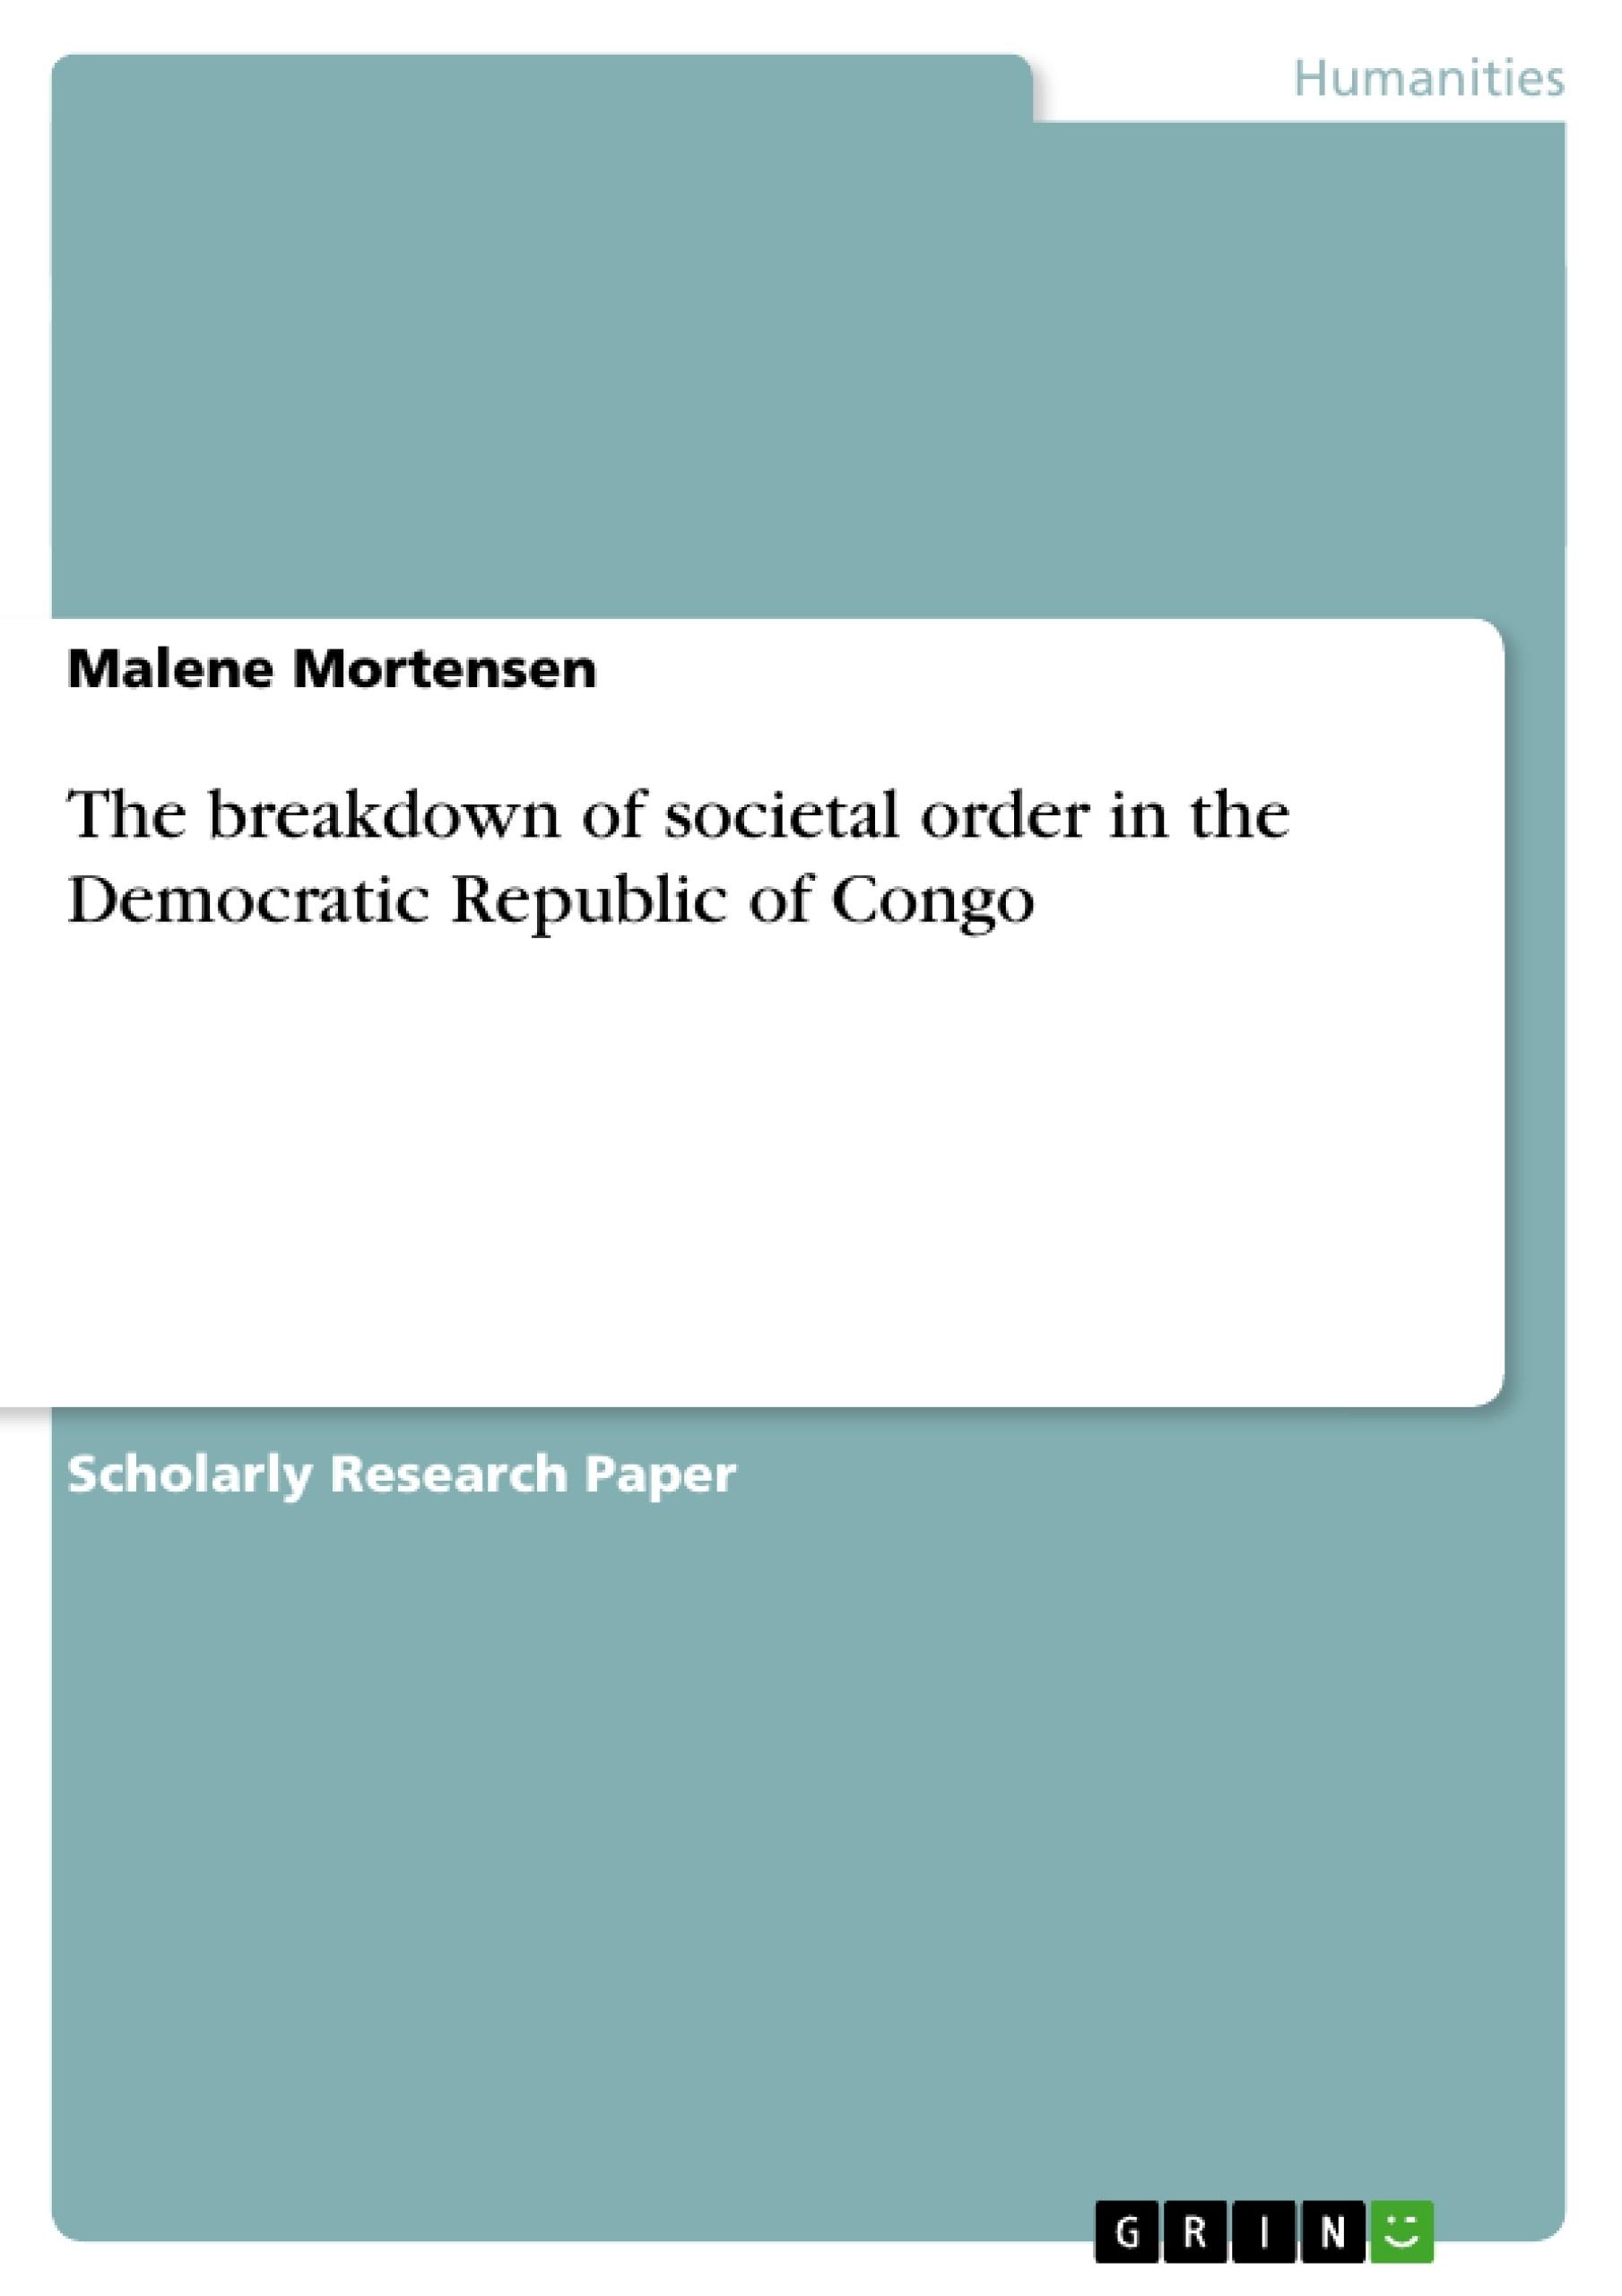 Title: The breakdown of societal order in the Democratic Republic of Congo